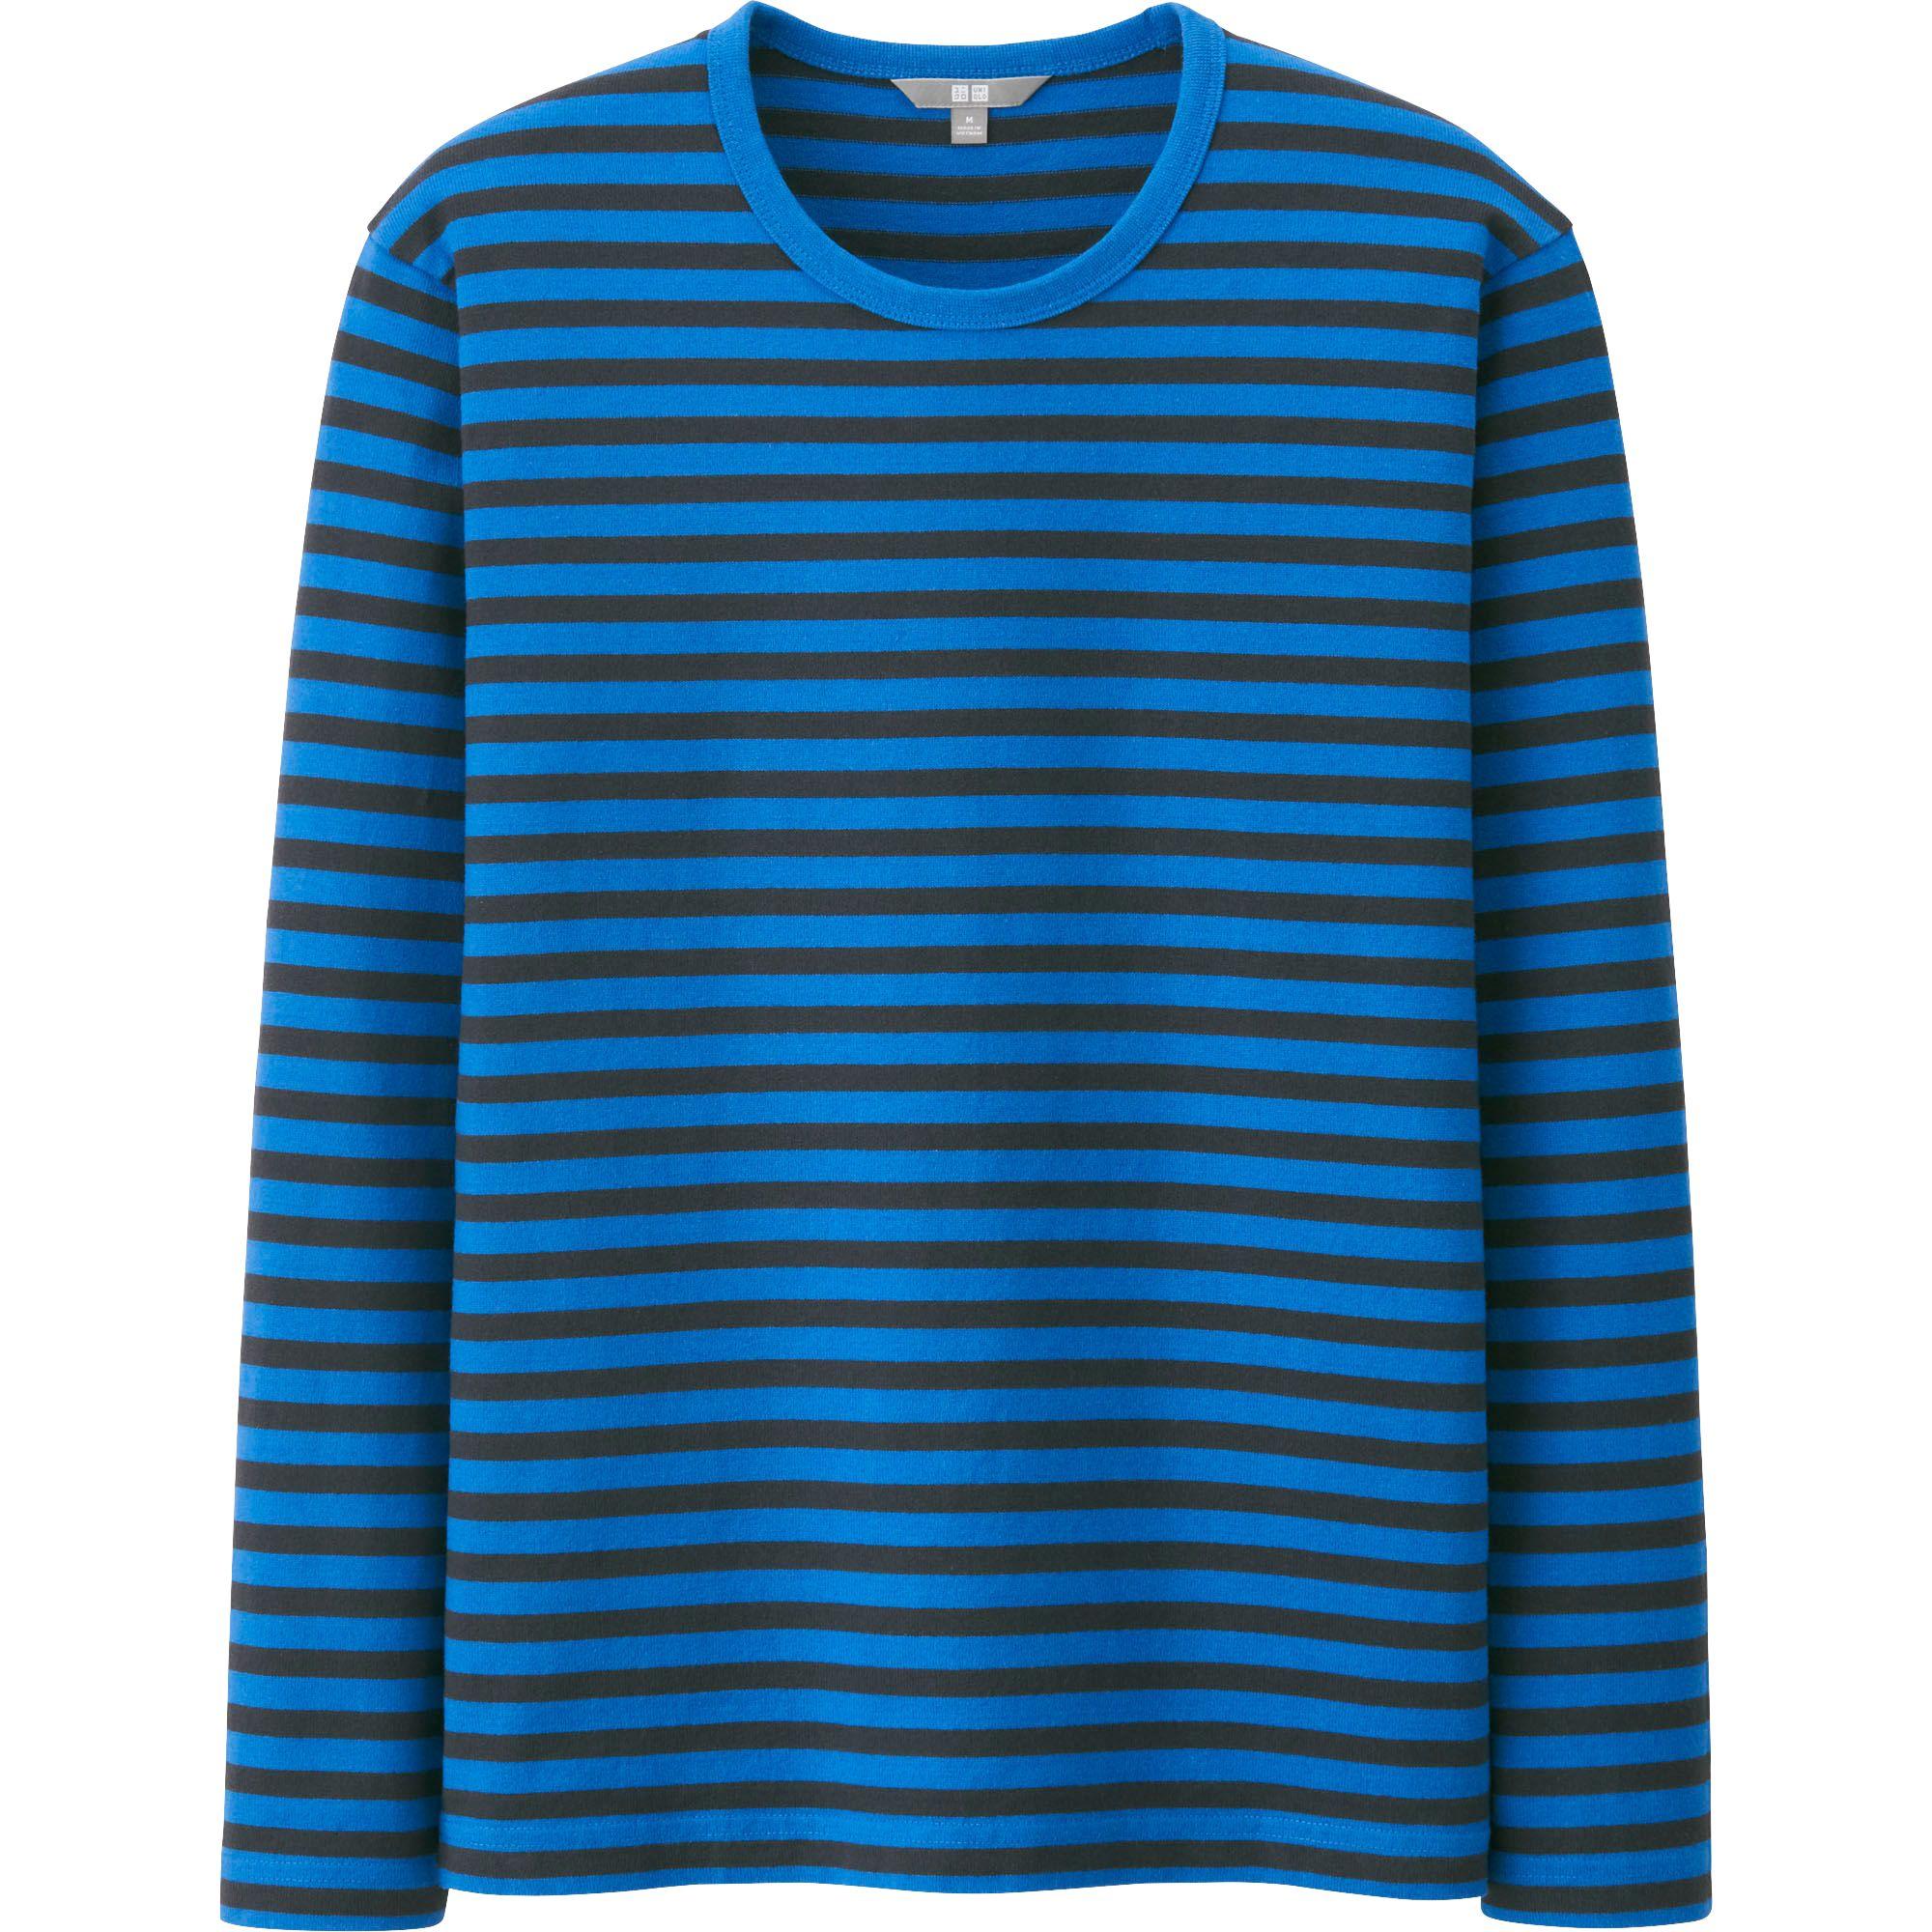 Uniqlo men washed crew neck striped long sleeve t shirt in for Mens striped long sleeve t shirt